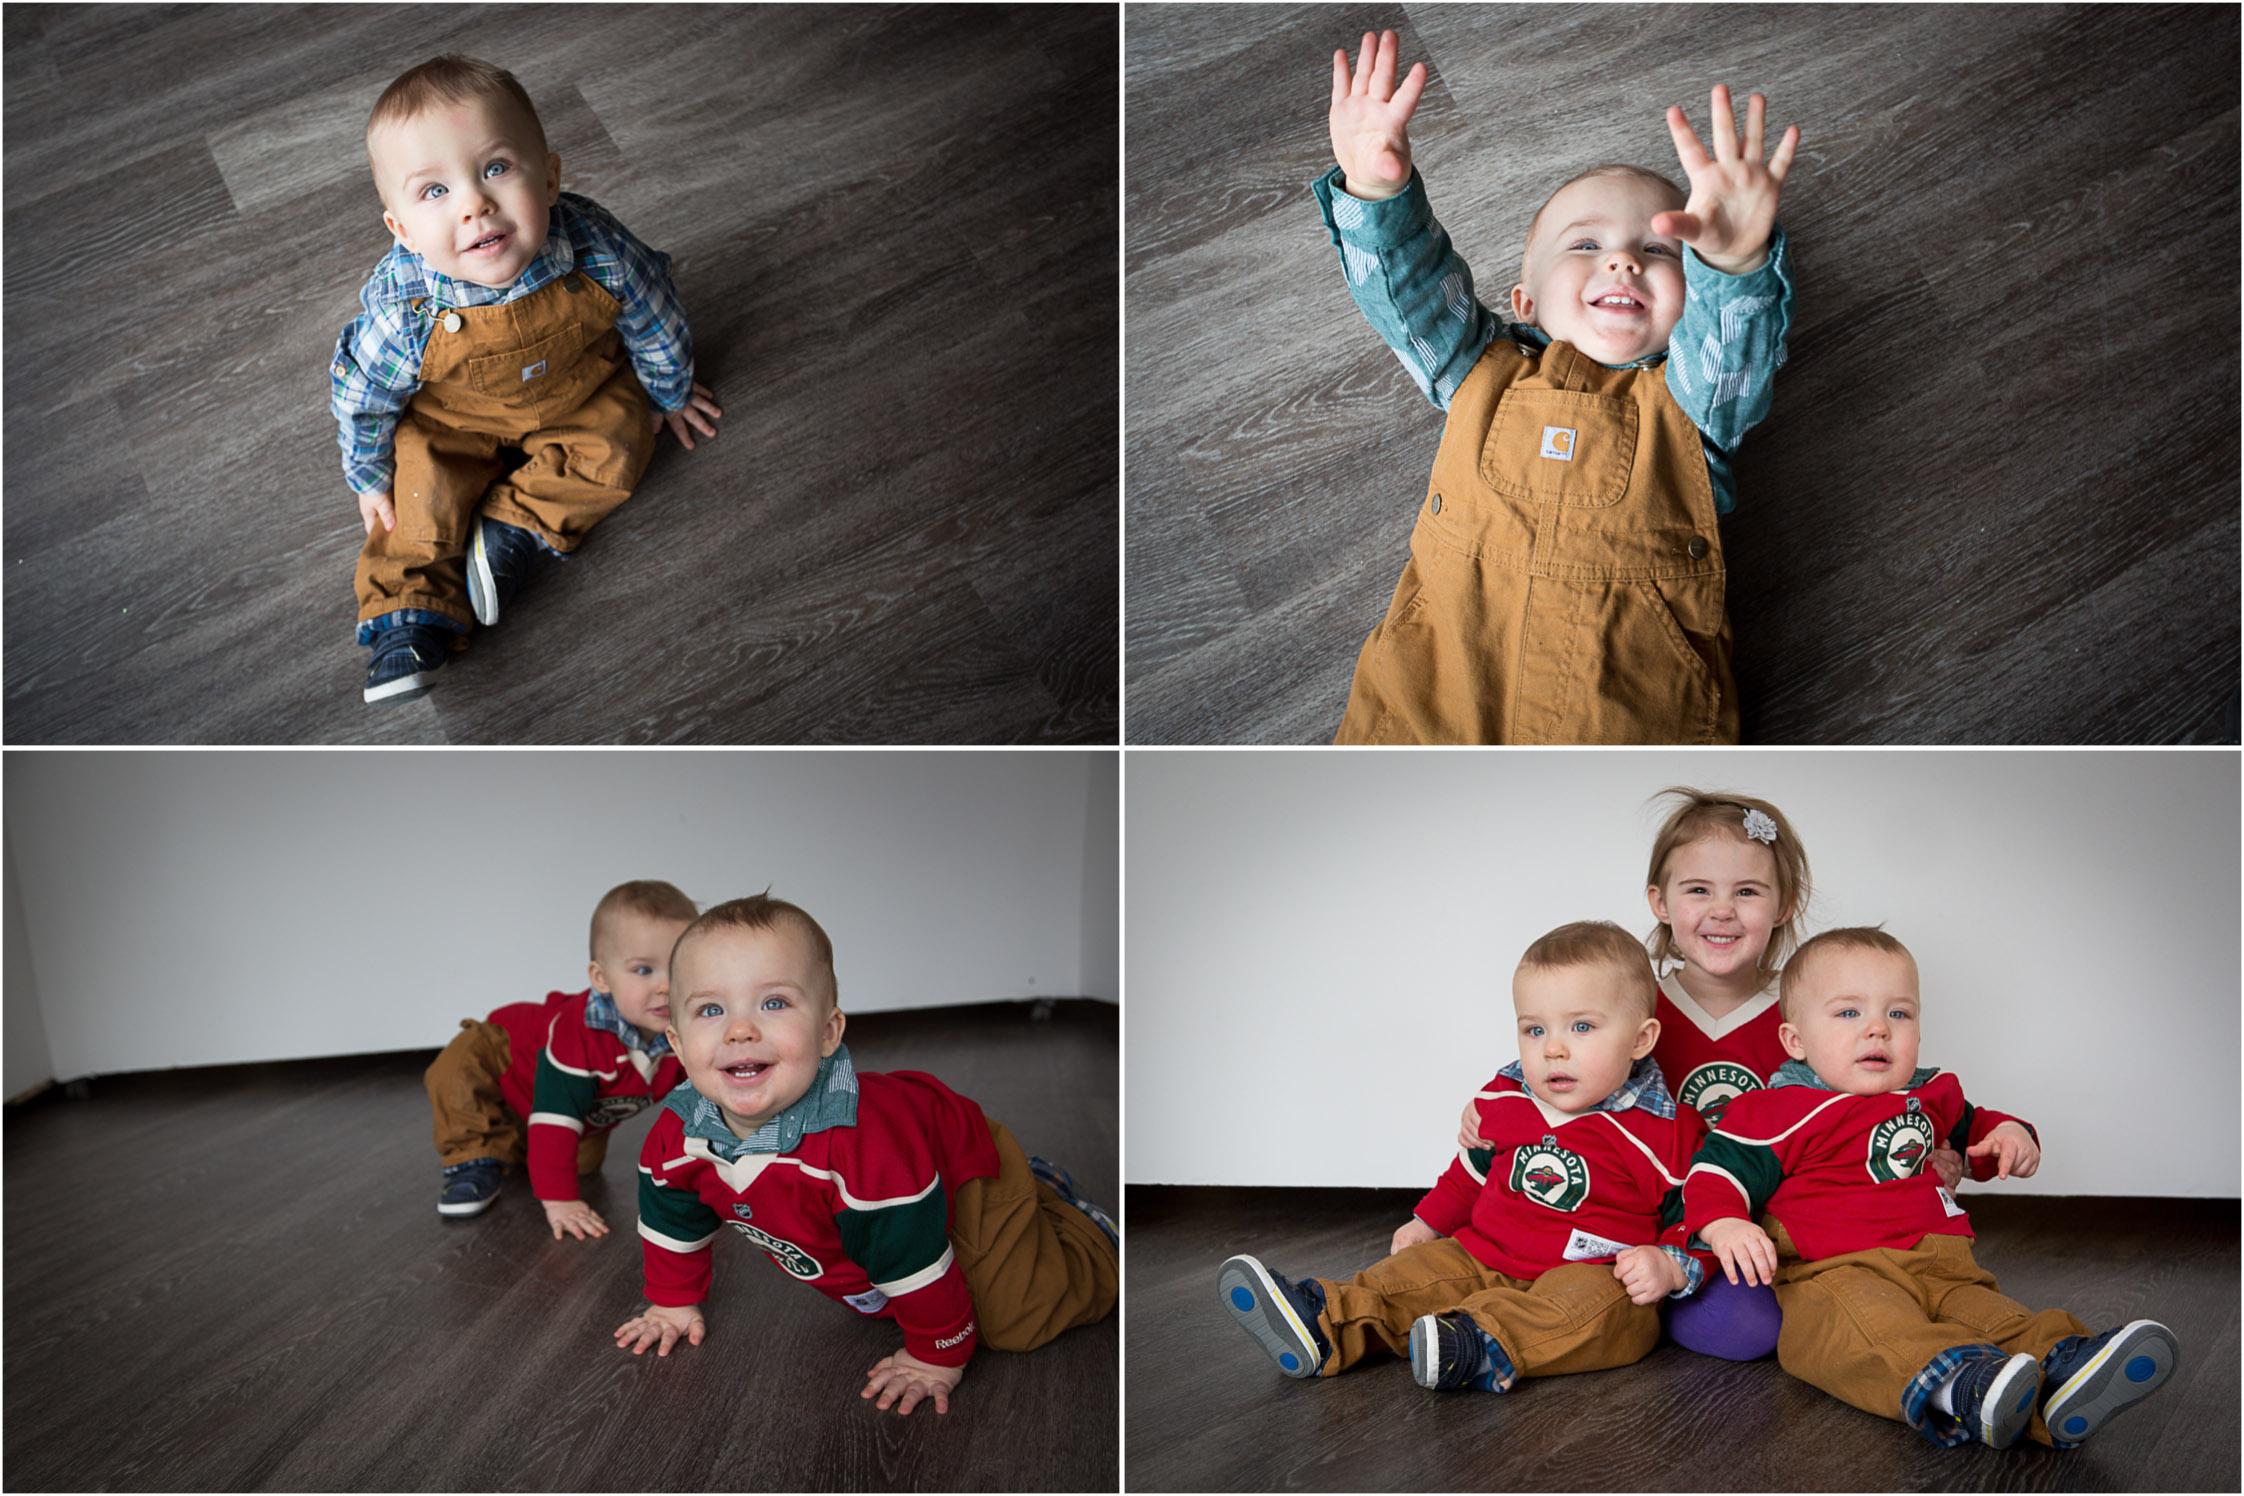 06-baby-wild-hockey-jerseys-twin-boys-one-year-old-big-sister-family-of-three-photo-session-studio-gray-couch-carhardt-overalls-block-studios-minnesota-mahonen-photography.jpg